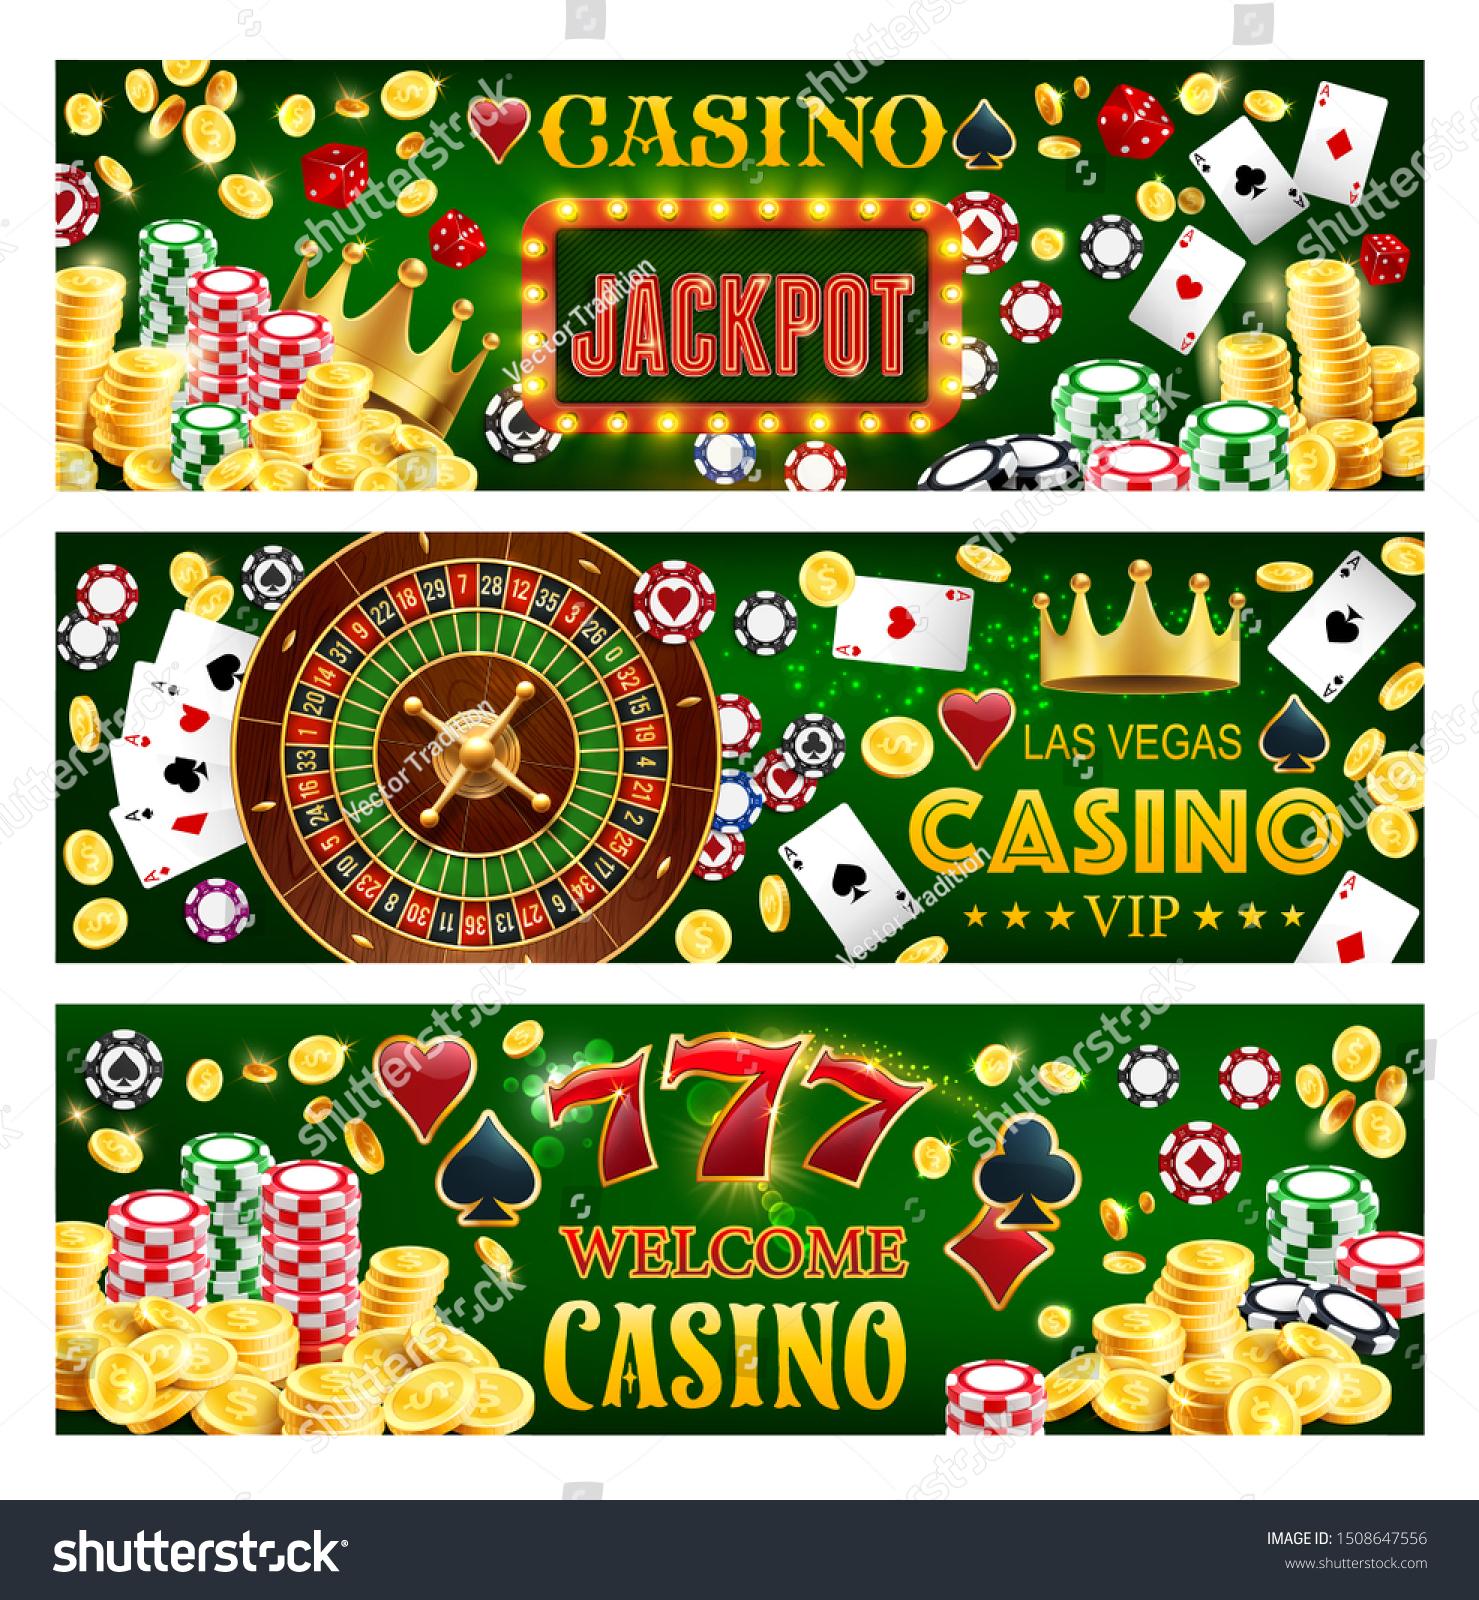 Casino Poker Gambling Roulette Jackpot Big Stock Vector Royalty Free 1508647556